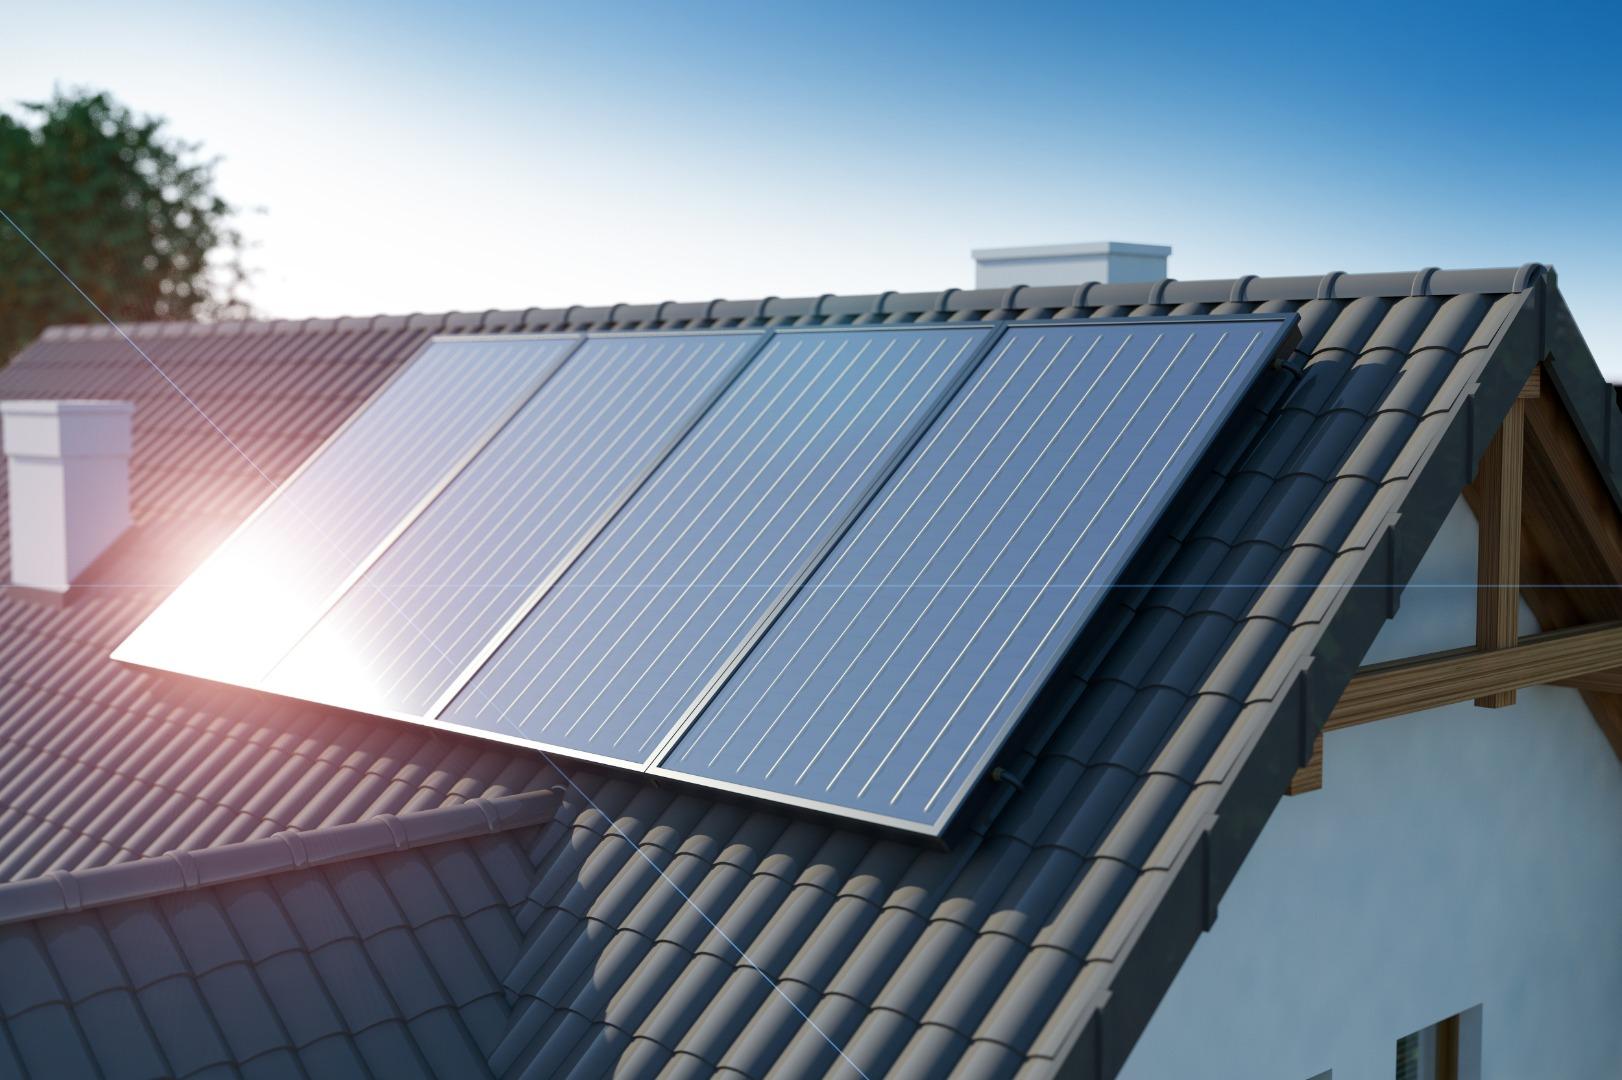 Choisir l'orientation d'une installation photovoltaïque